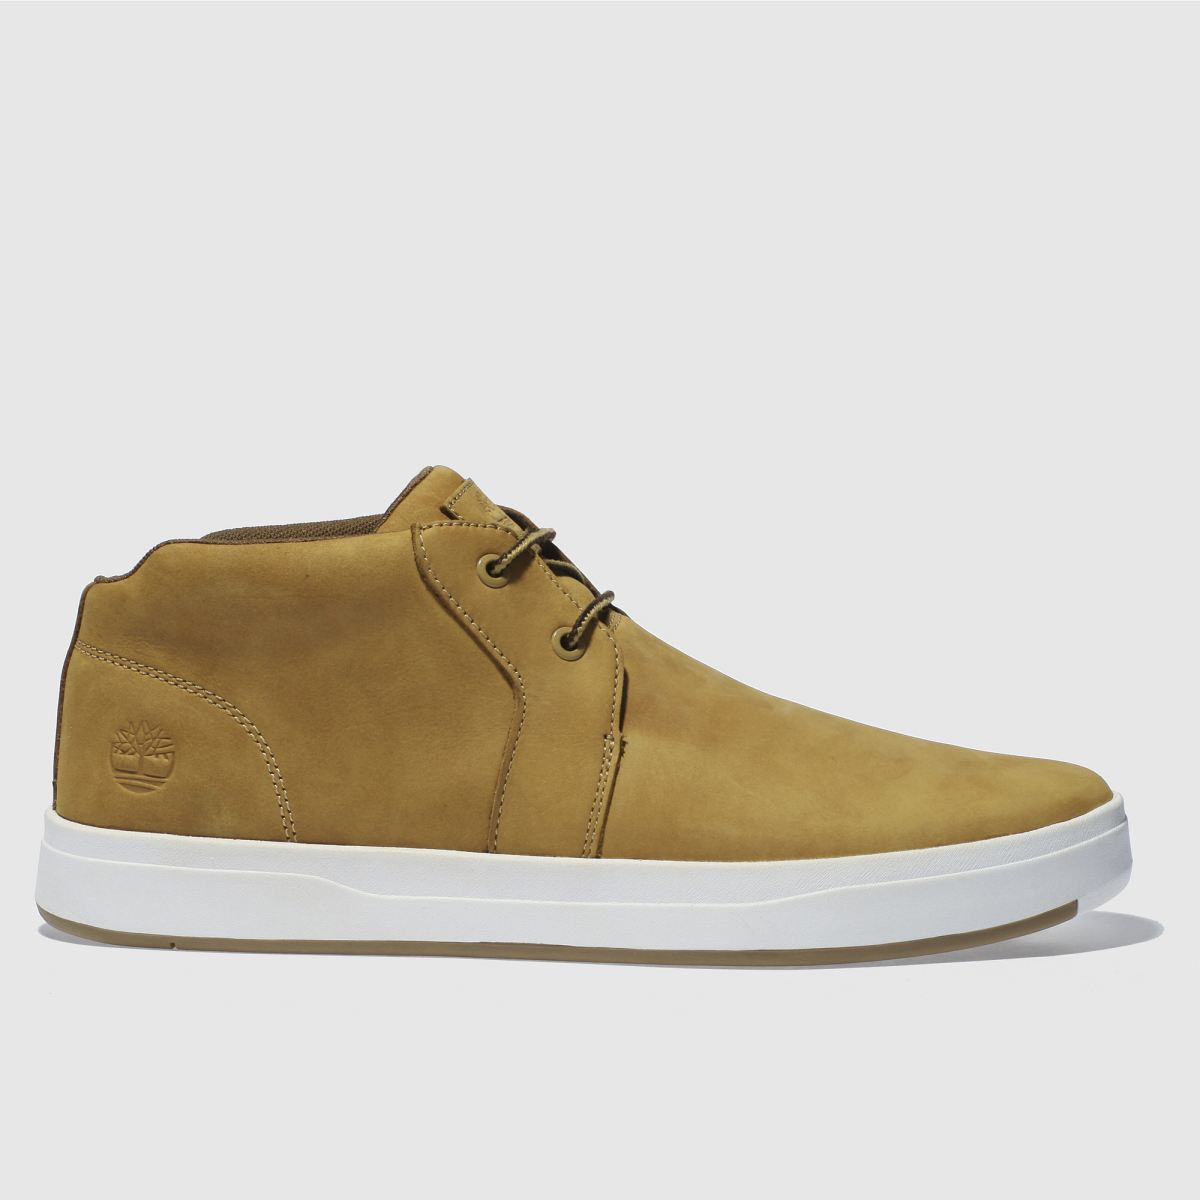 Timberland Tan Davis Square Boots